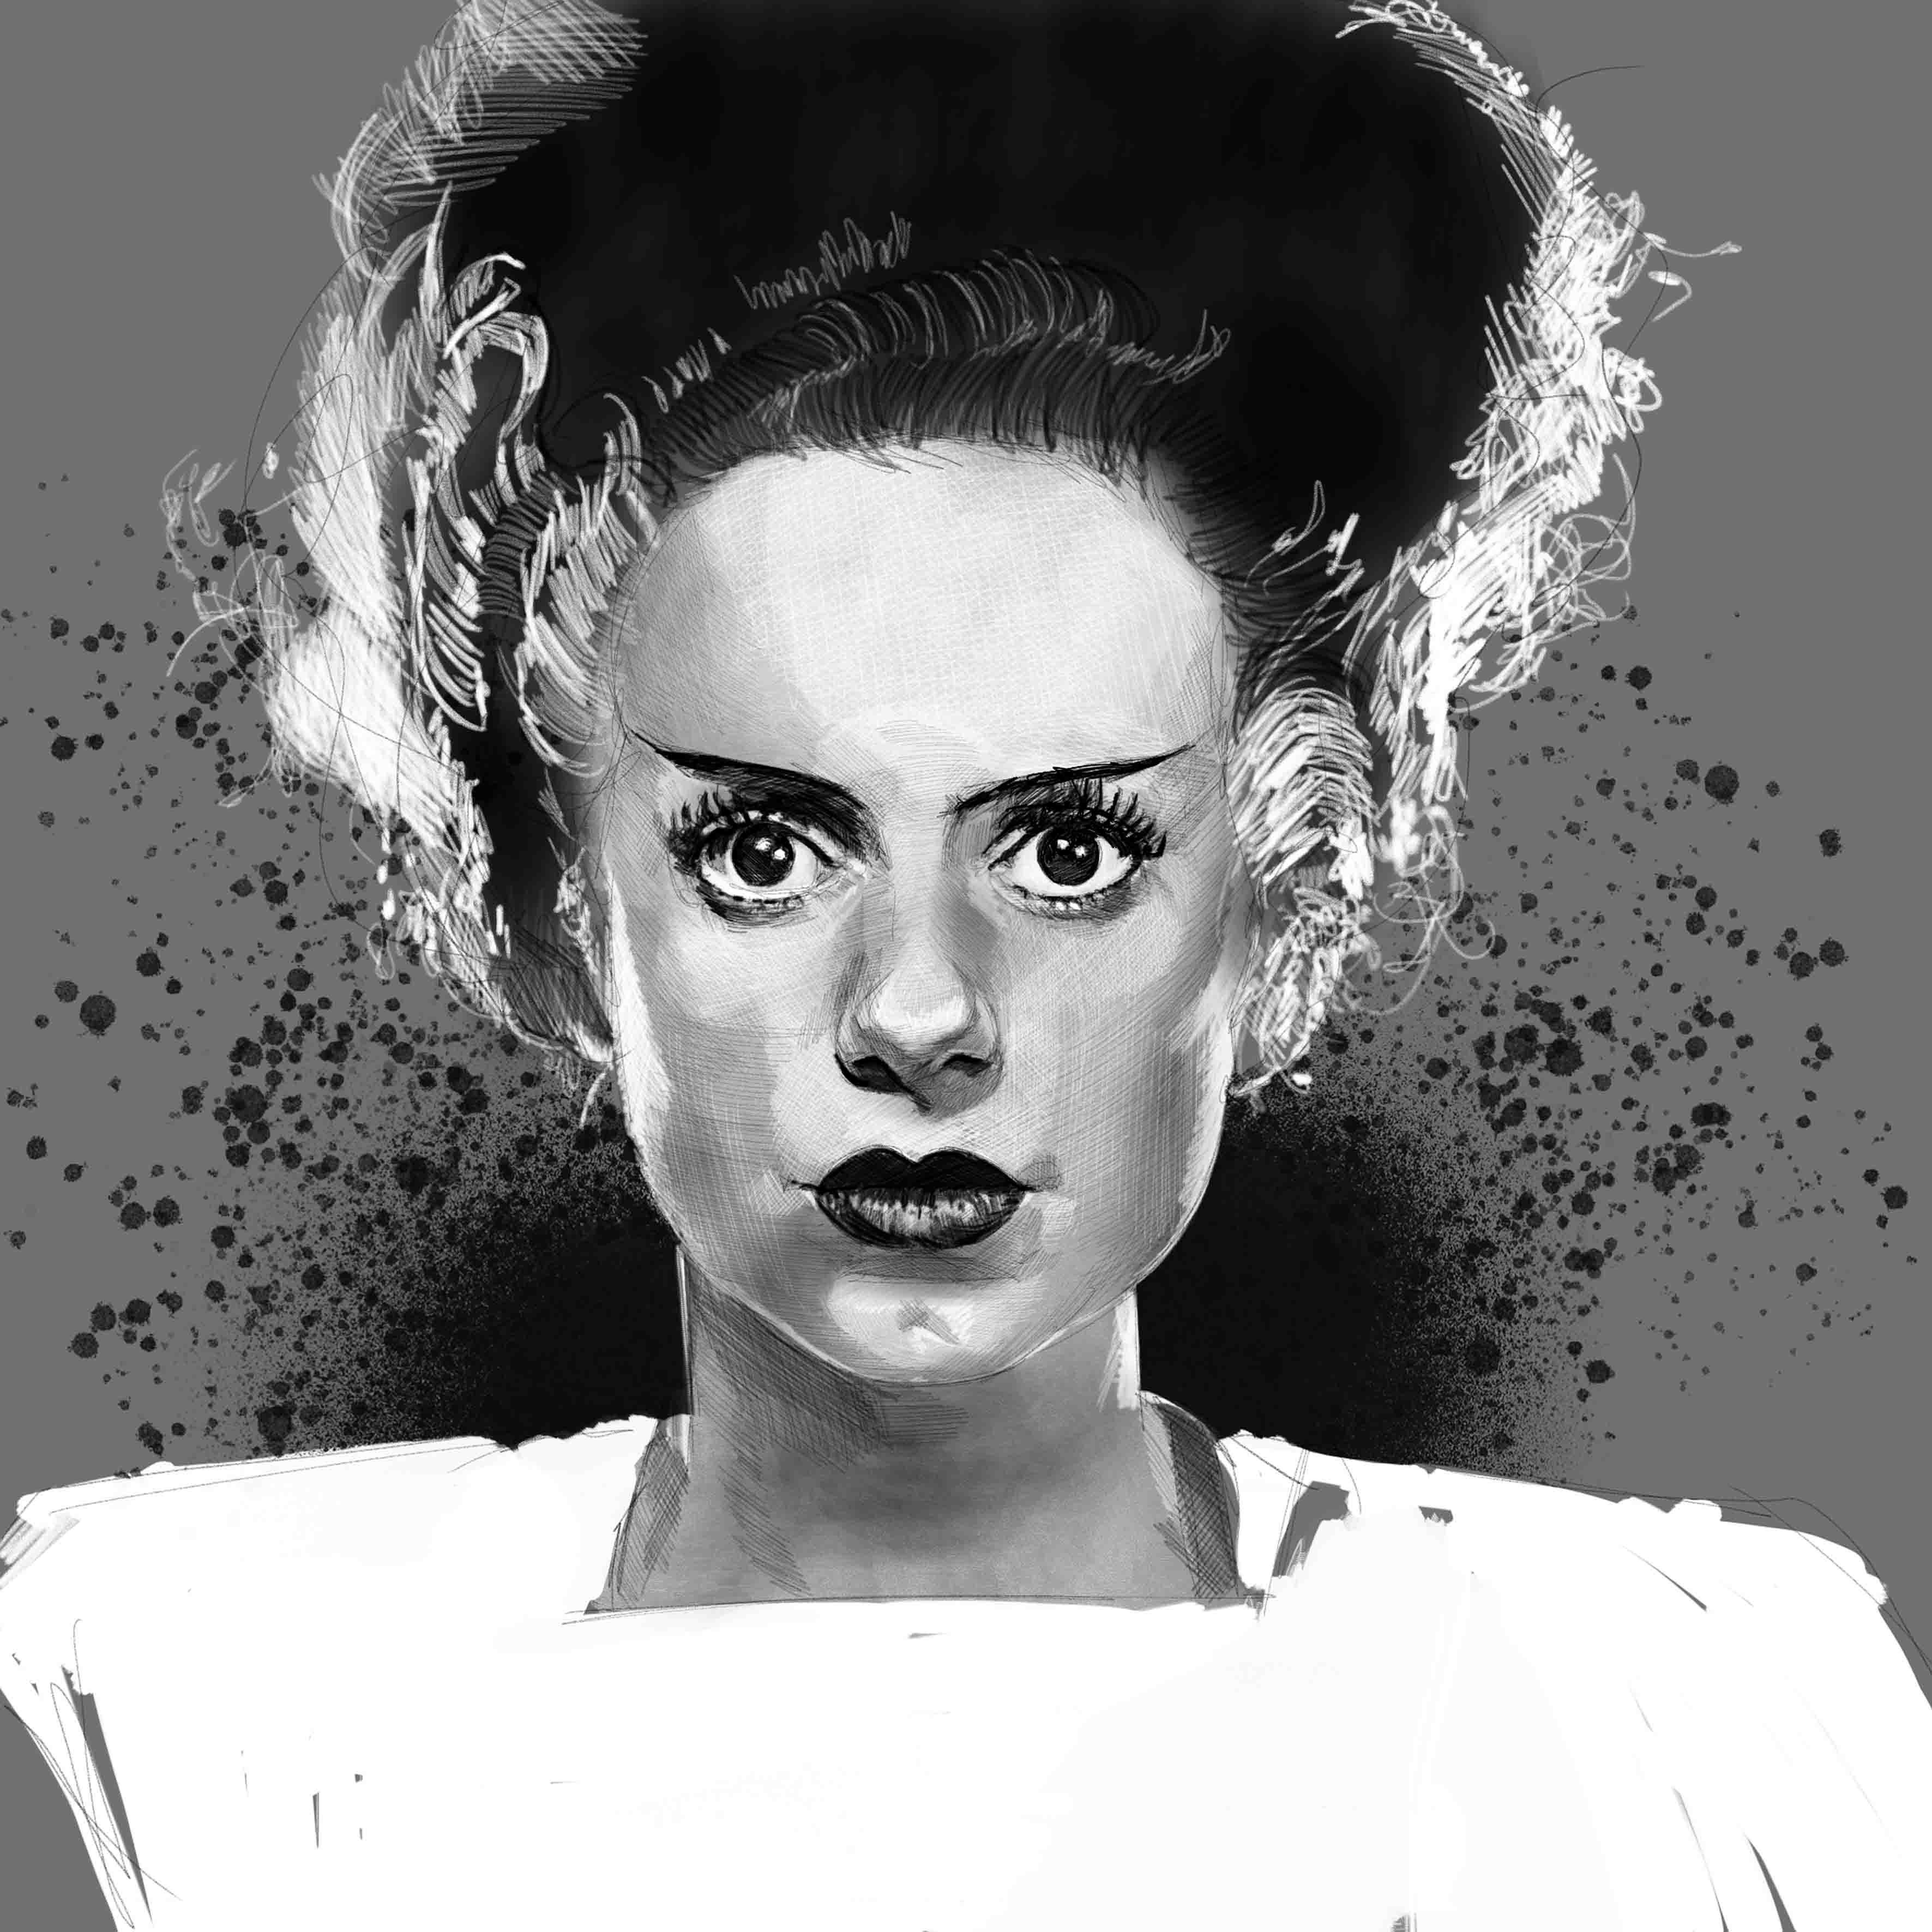 Elsa_lanchester-tito-culba